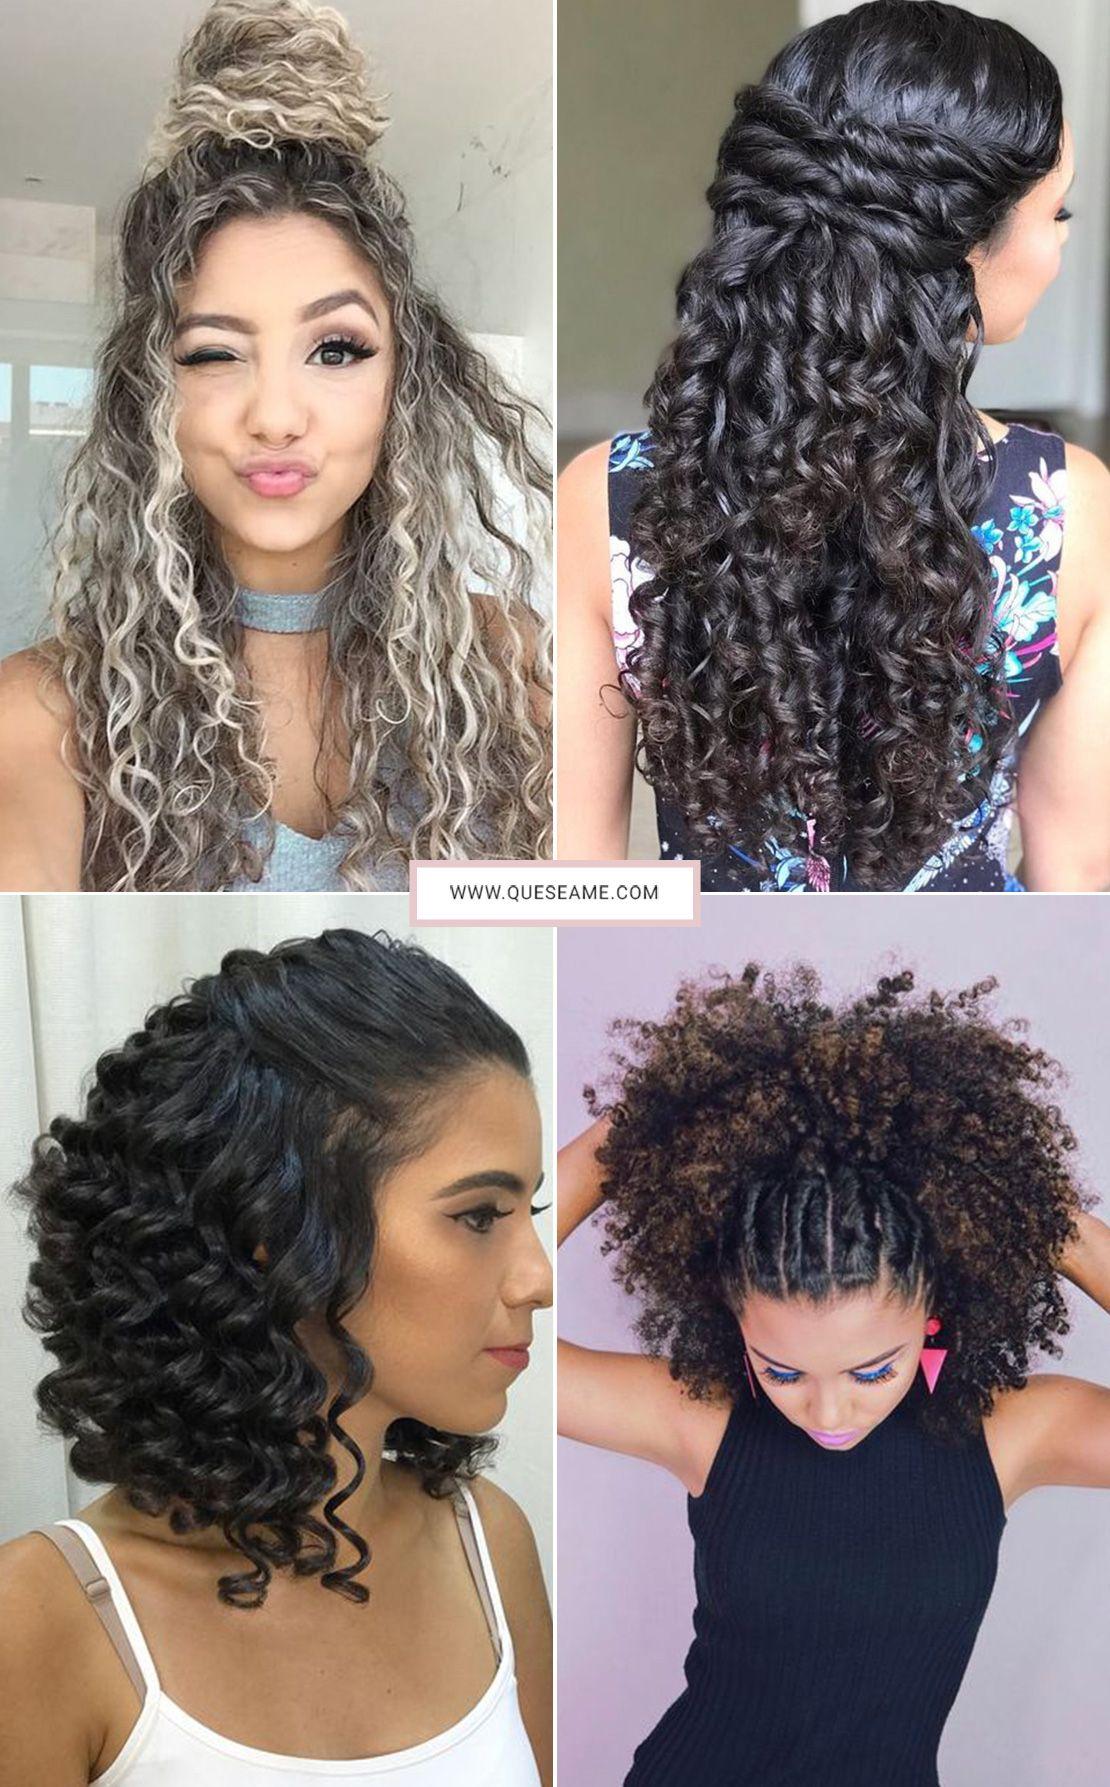 Penteados Para Cabelos Cacheados Hair Penteado Cabelo